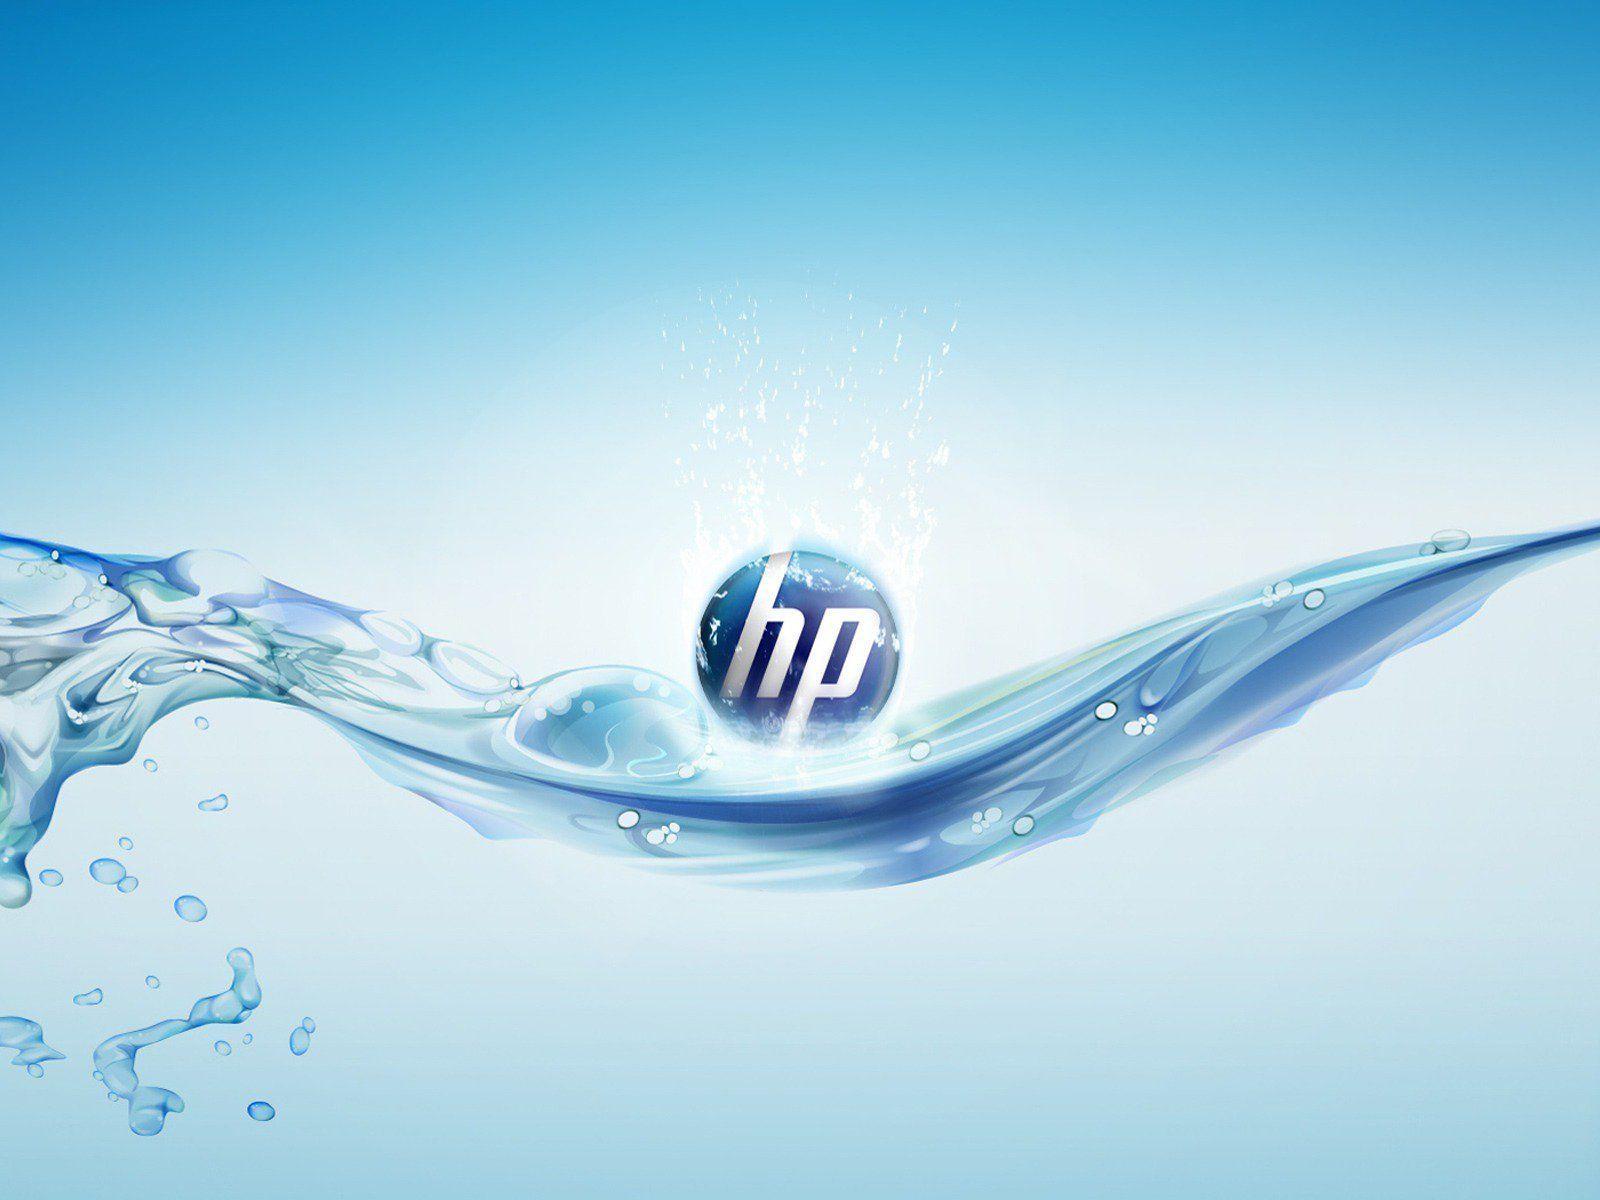 Hp Laptop Wallpapers  HD Wallpapers  Pinterest  Wallpaper, Laptop wallpaper and Desktop